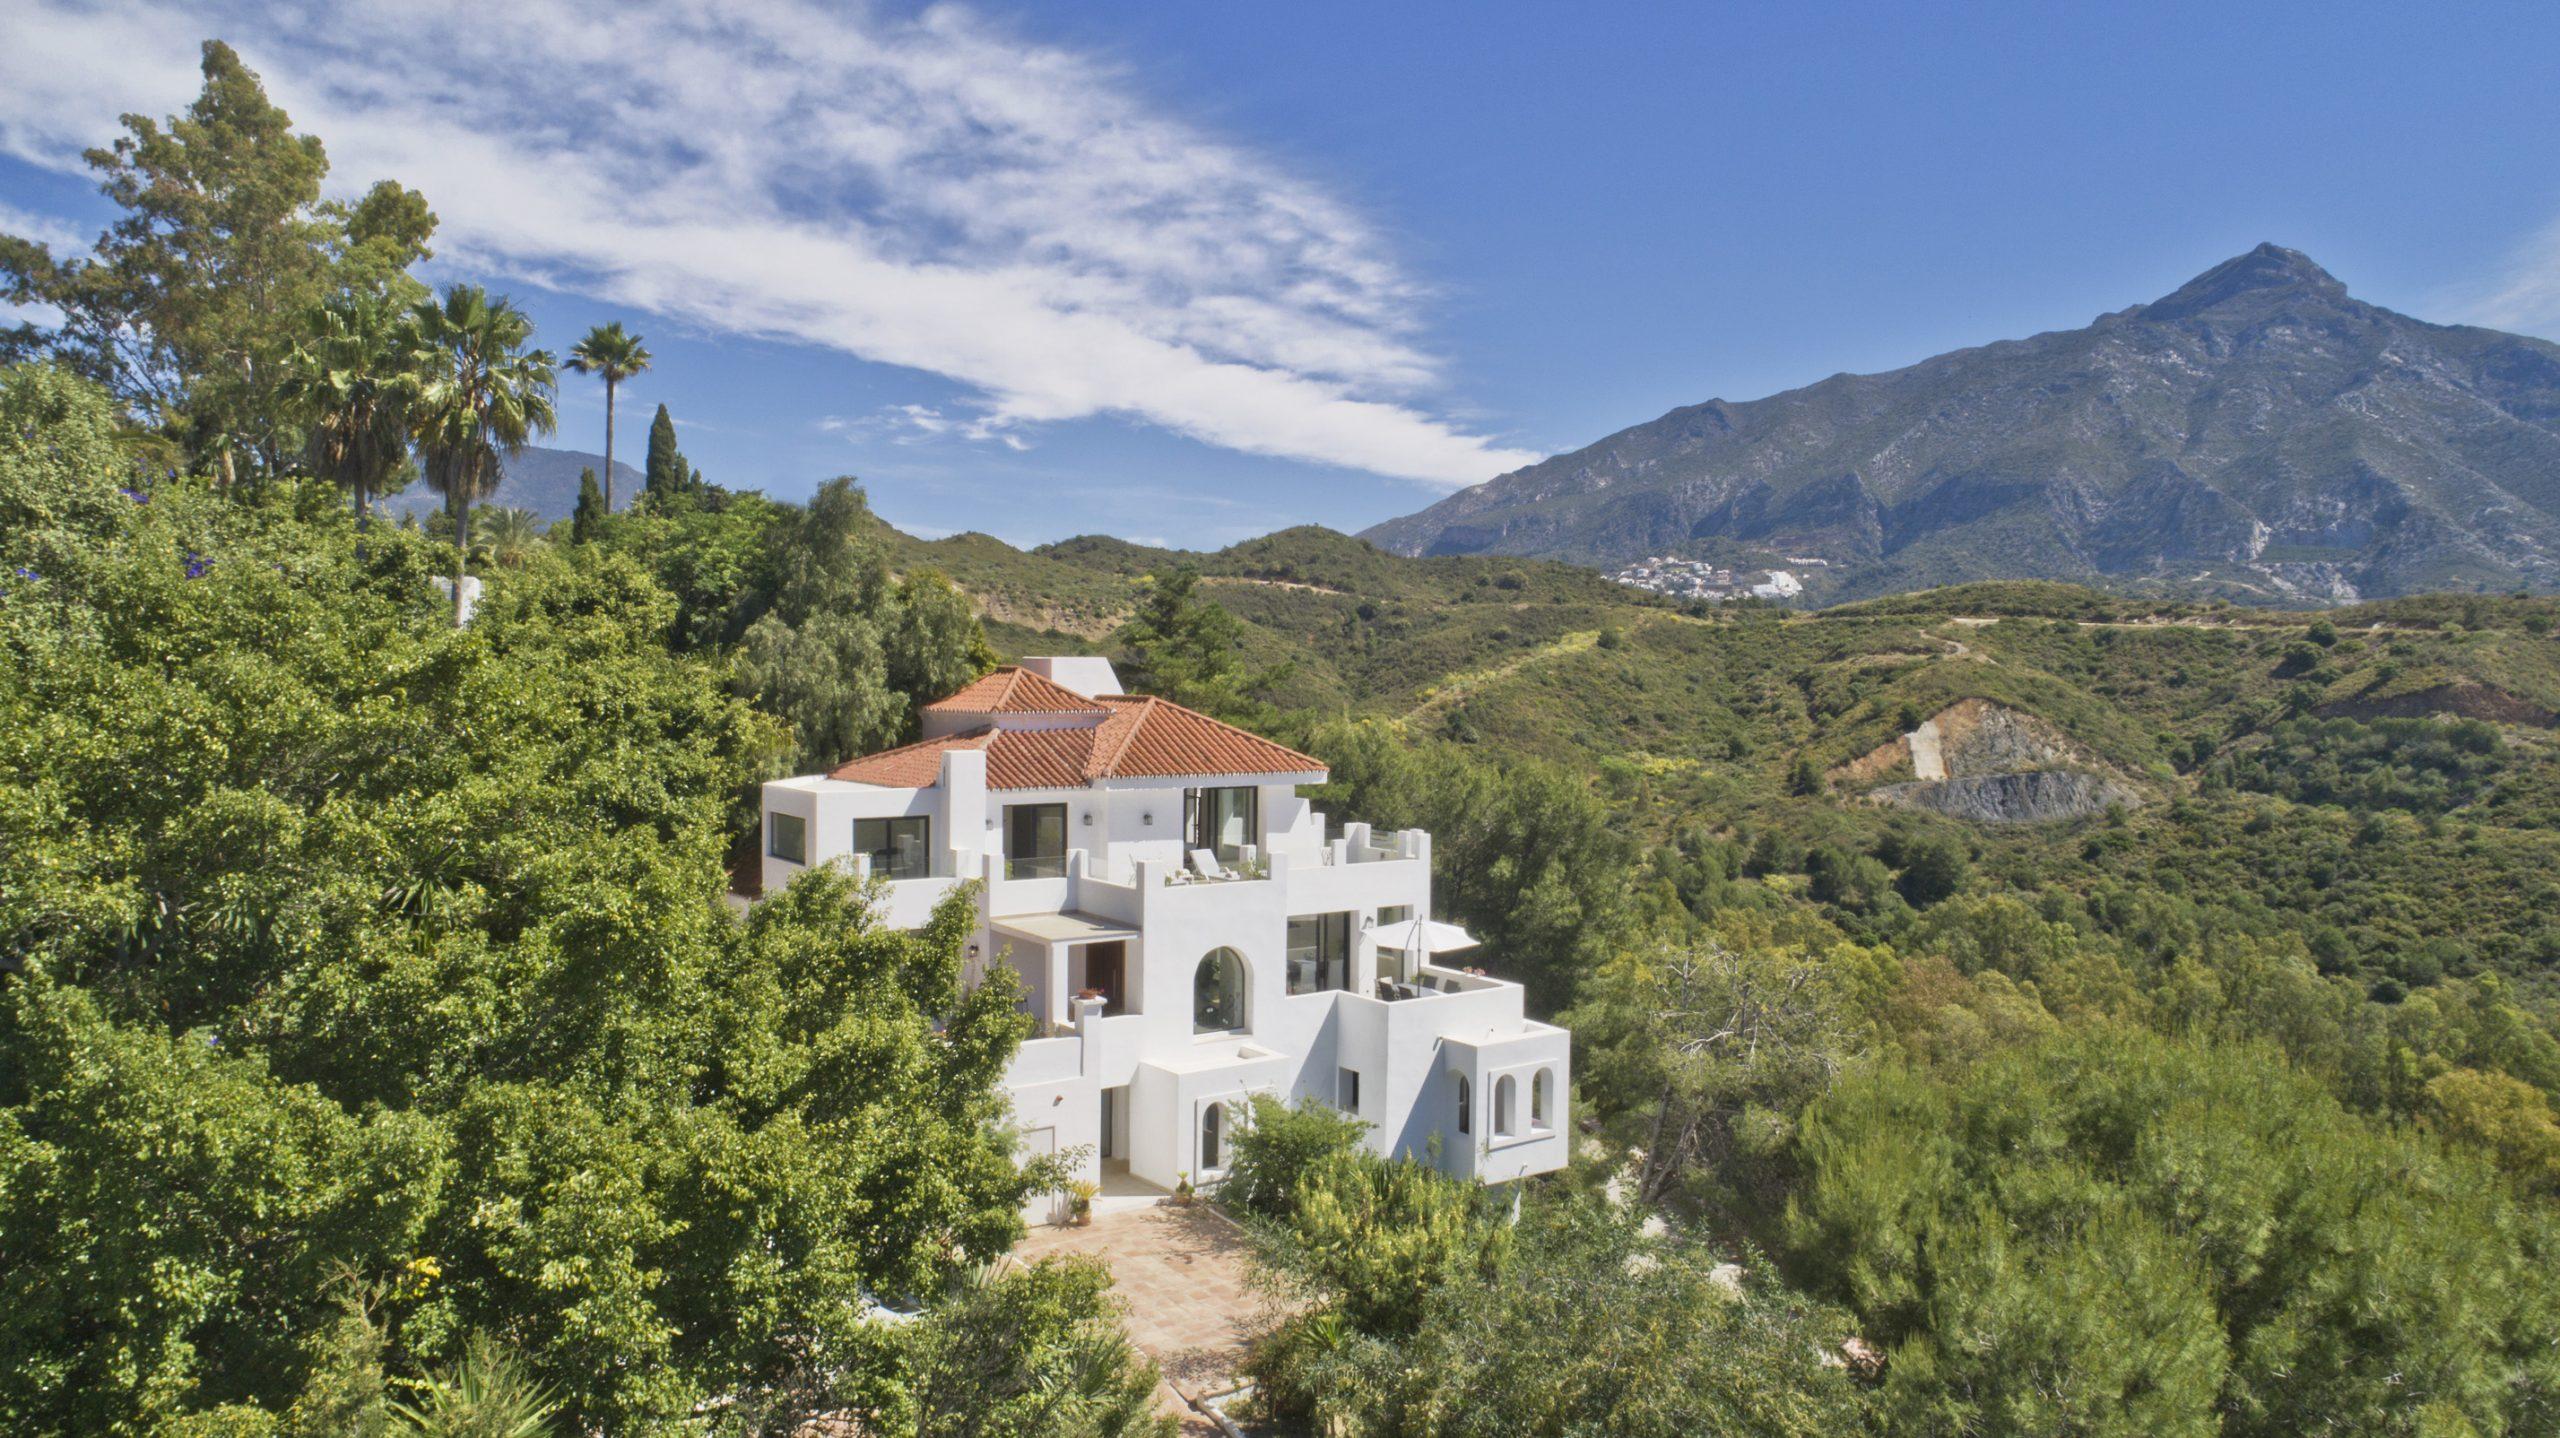 Property Photography Marbella, Gary Edwards, Real Estate Photography Marbella, Photos Marbella, Photographer Marbella